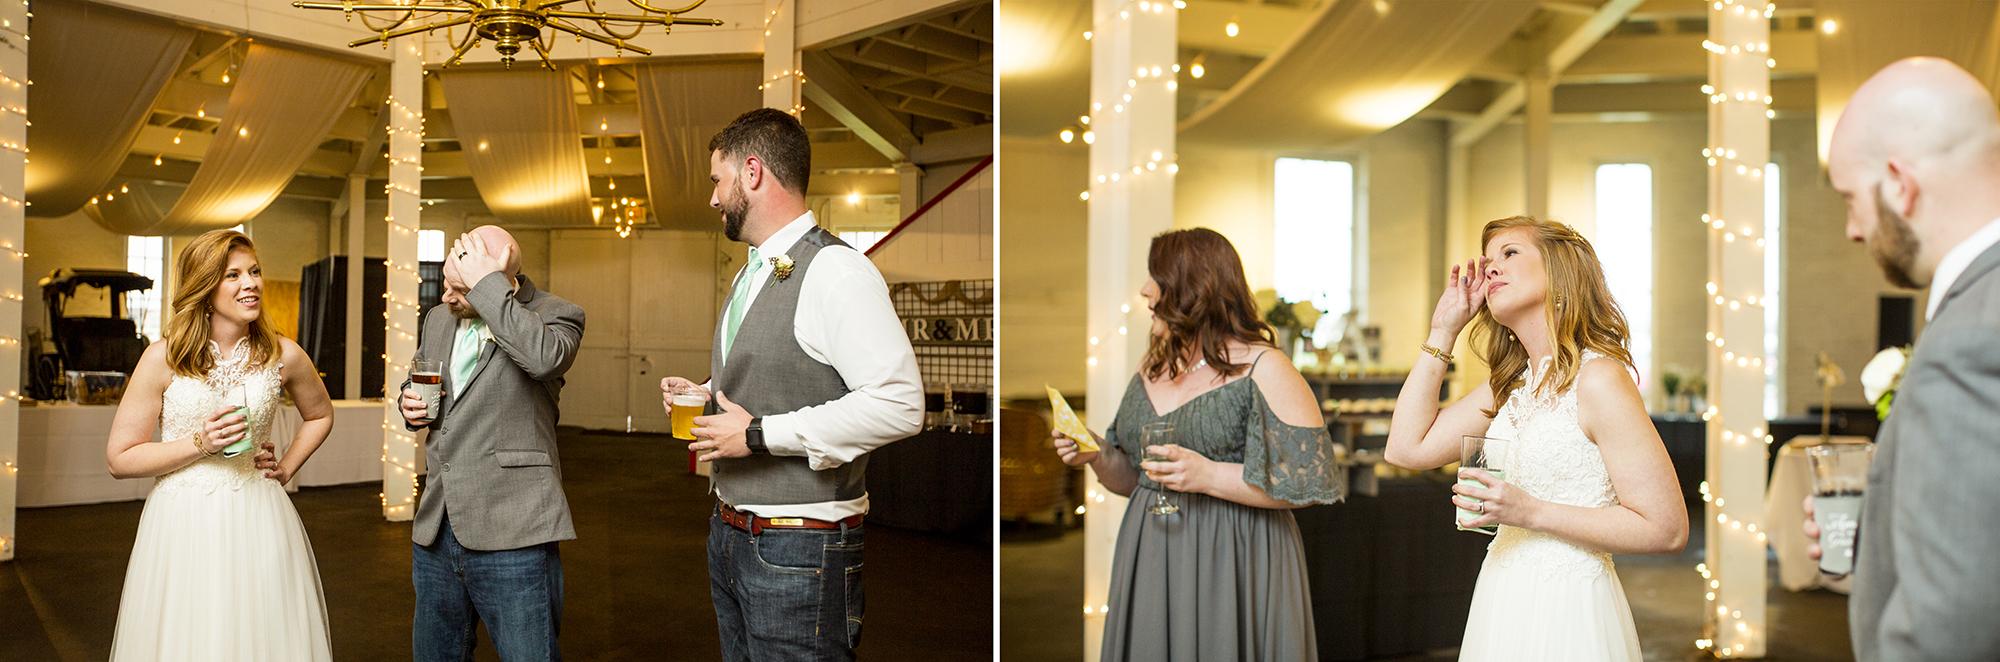 Seriously_Sabrina_Photography_Lexington_Kentucky_Red_Barn_Red_Mile_Wedding_Detoma74.jpg